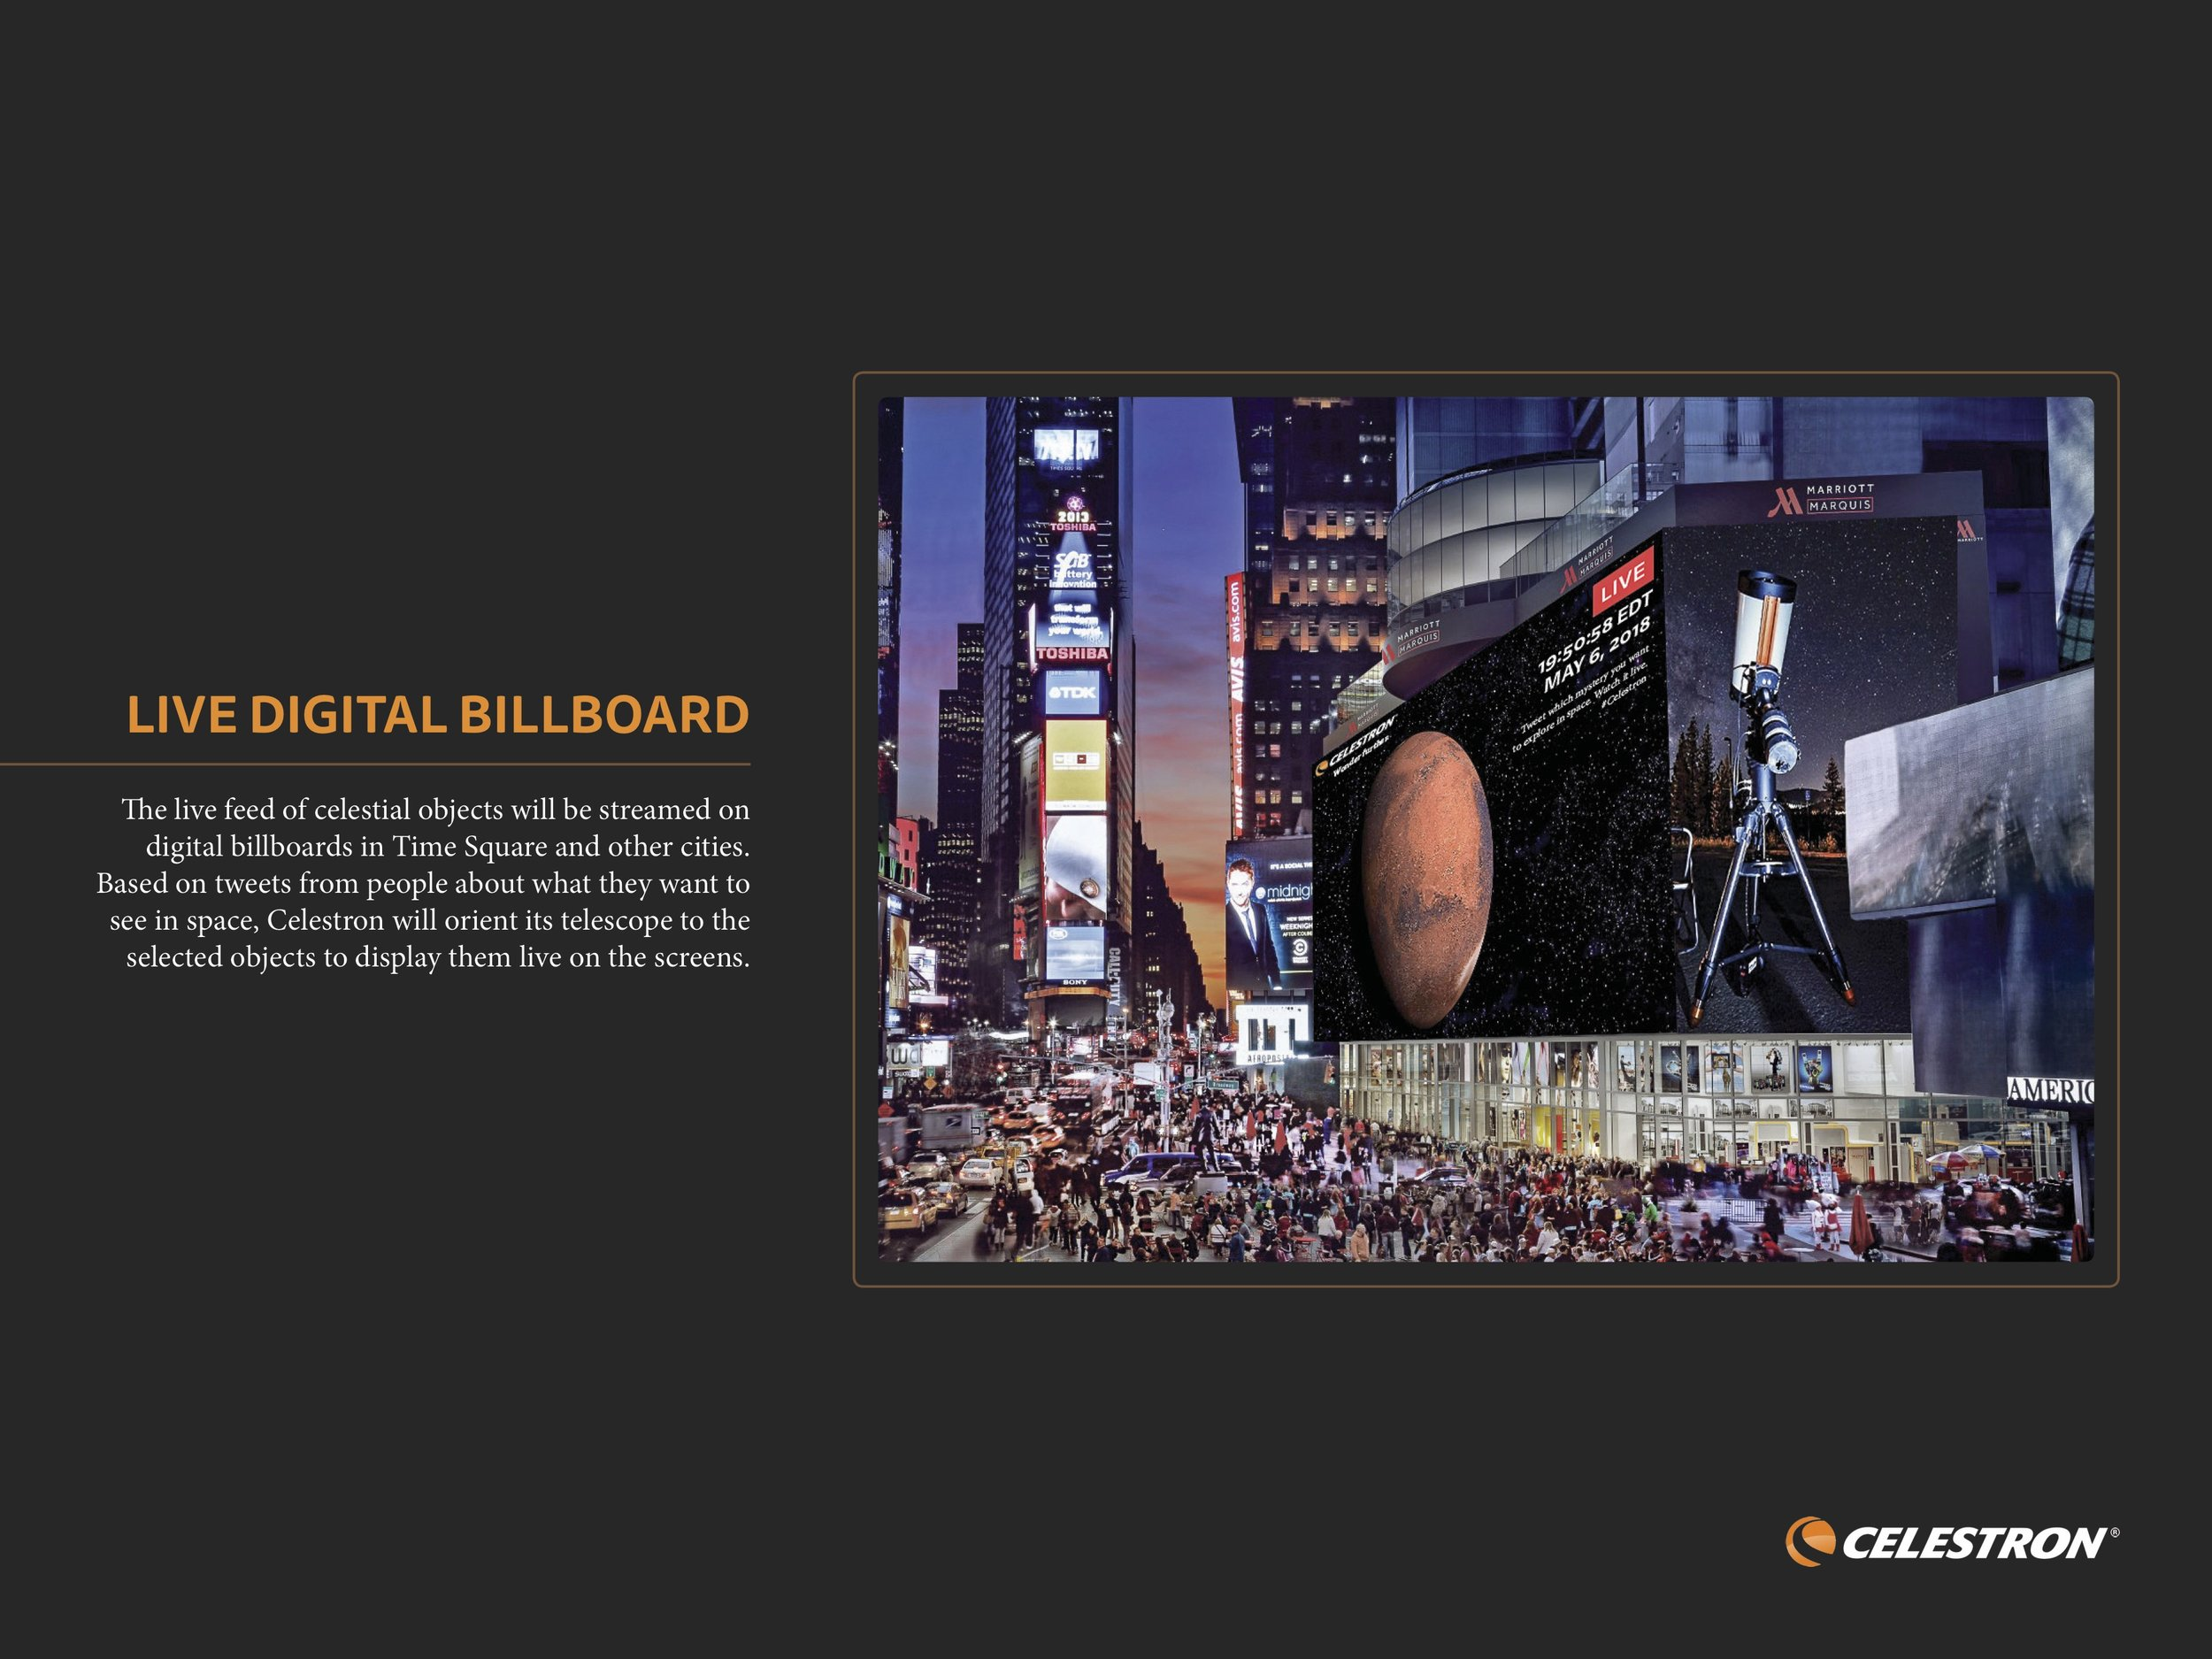 (Celestron) Live billboard.jpg